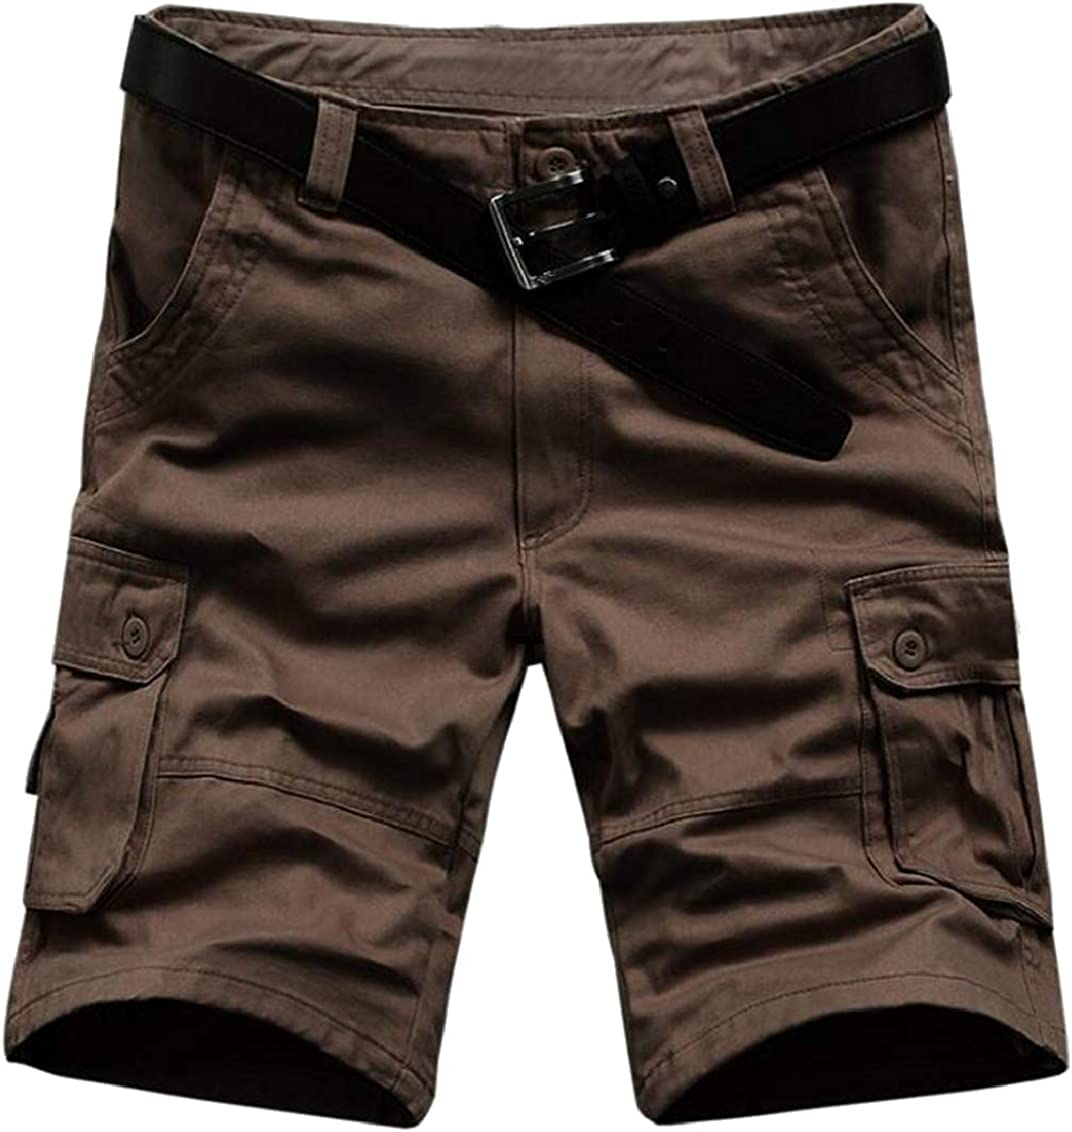 Suncolor8 Mens Multi Pockets Outwear Stylish Straight Leg Cotton Cargo Shorts